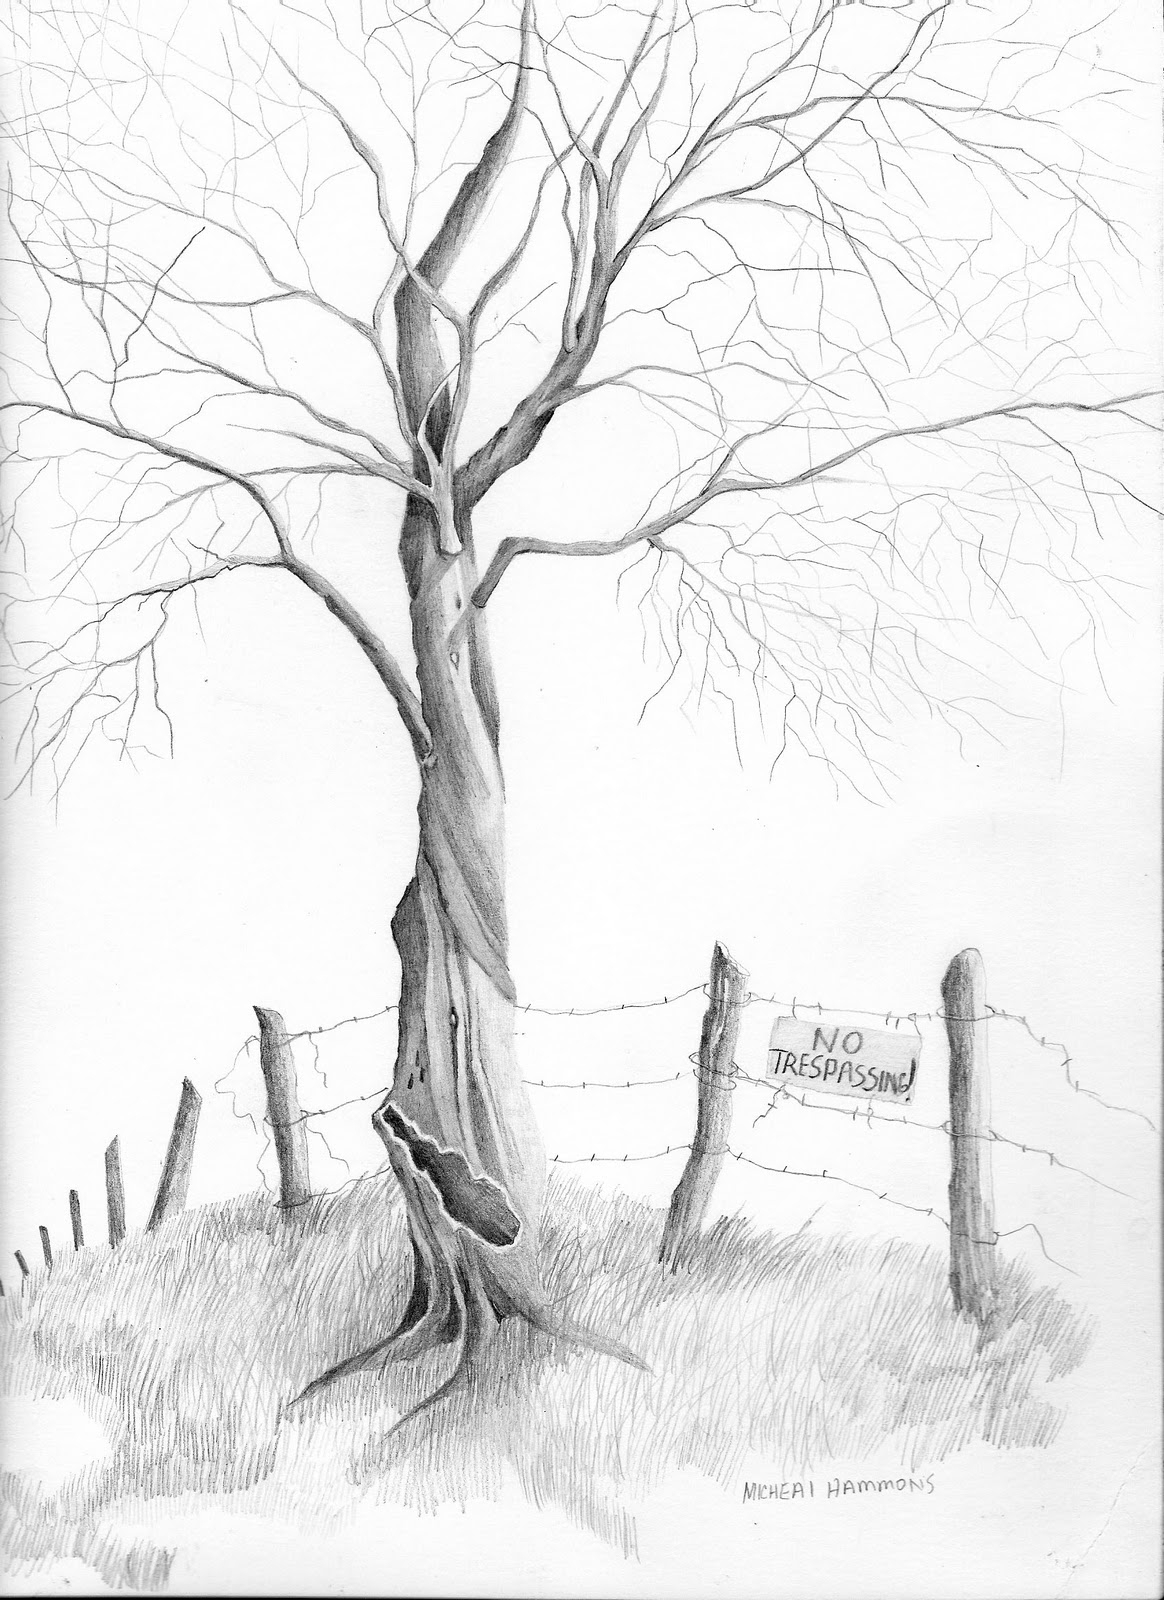 1164x1600 Tree Pencil Sketch Pencil drawings Pencil Drawing Of Tree